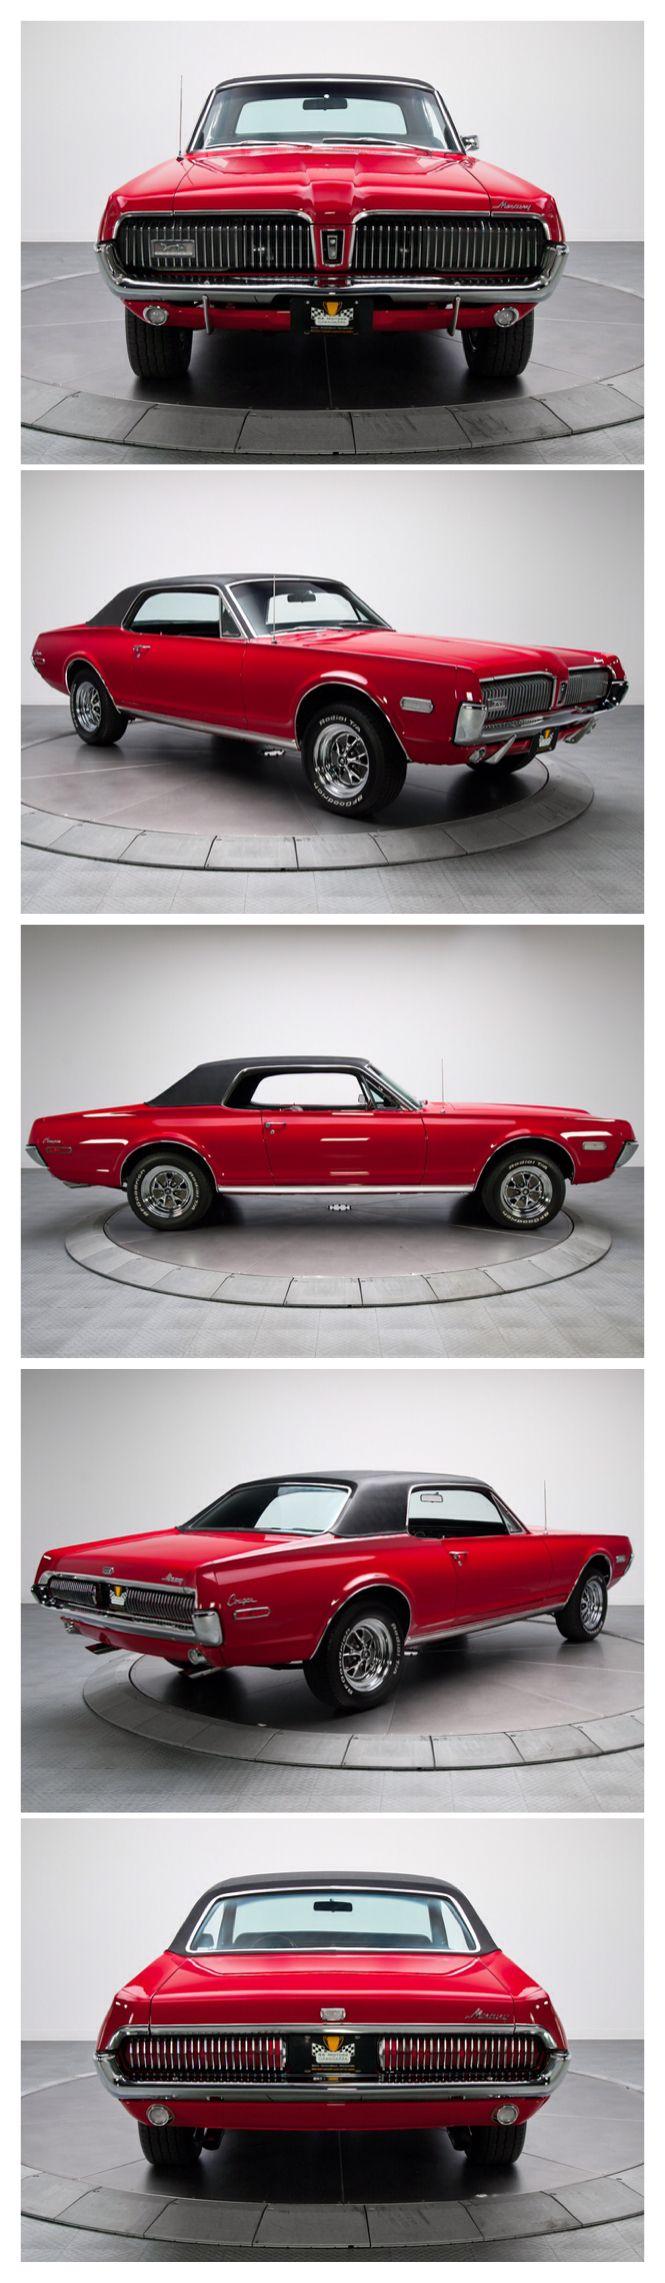 Luxury caravan with full size sports car garage from futuria - 1968 Mercury Cougar